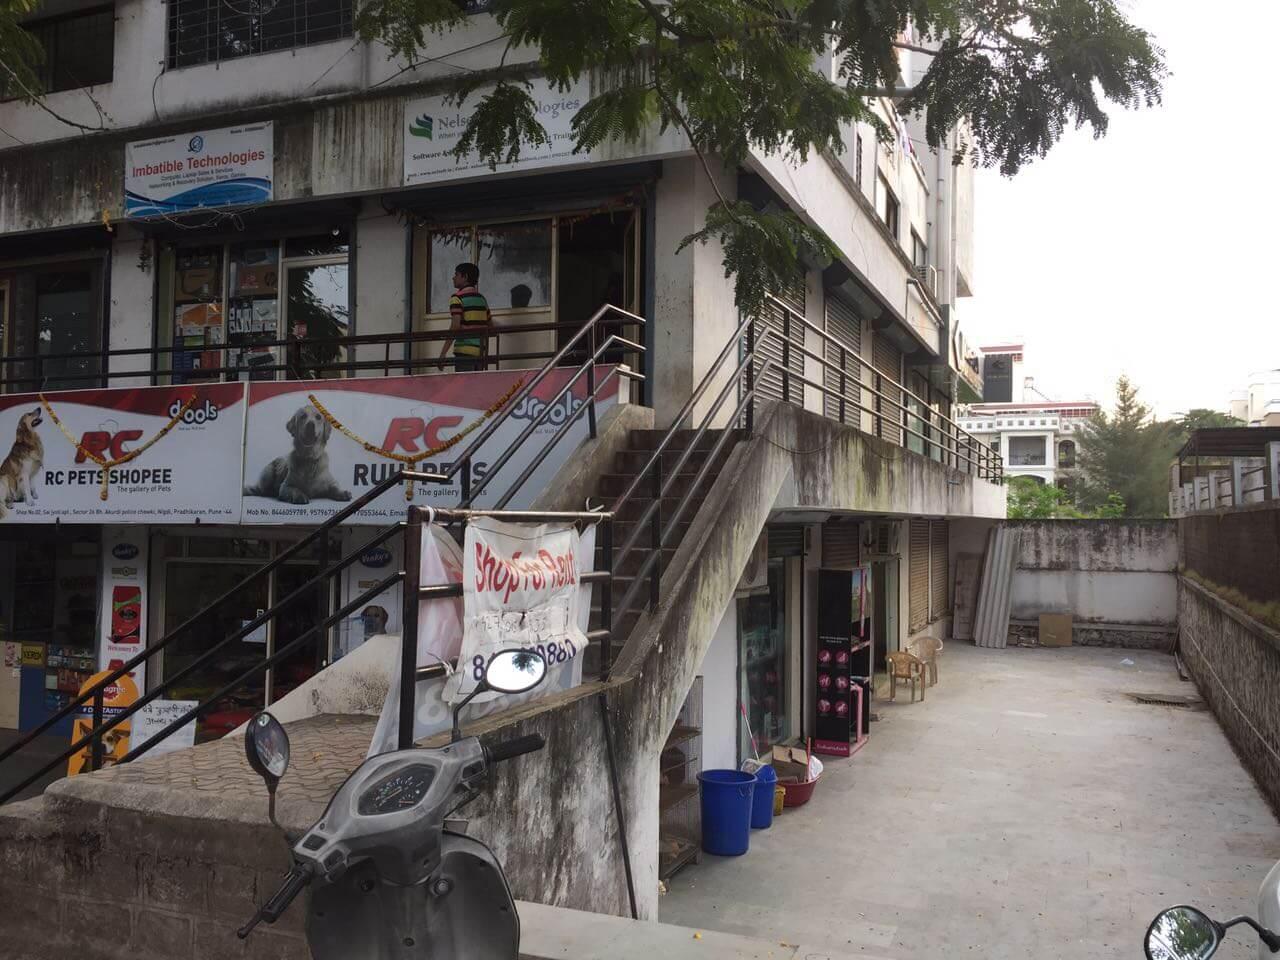 Shop for rent nxt to akurdi police chowky 4-300Sqft,  Shop 5-250Sqft, Shop 6-250Sqft .